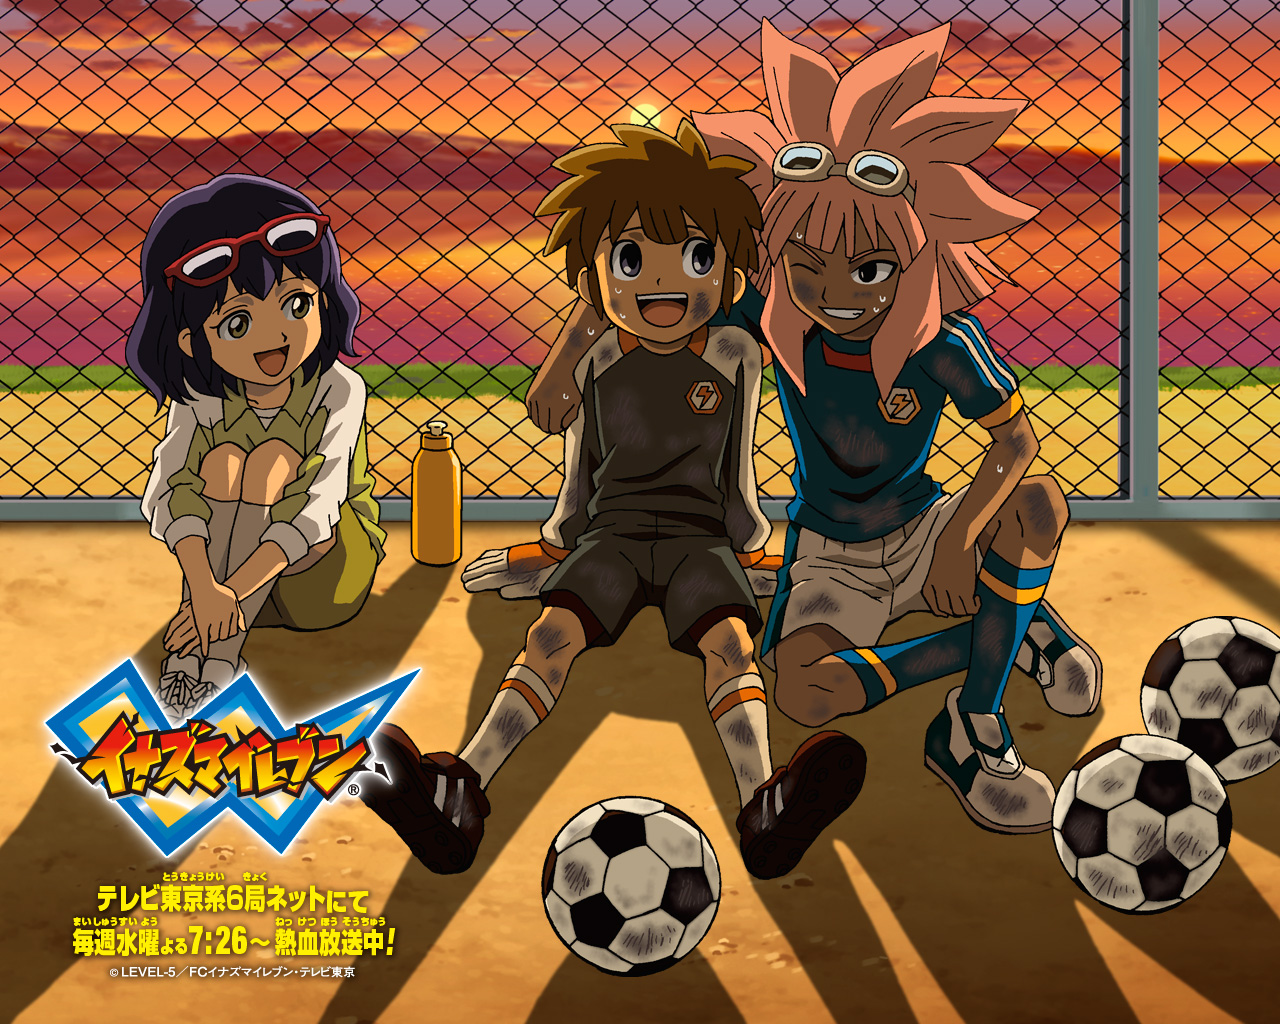 Inazuma Eleven Wallpaper 372511 Zerochan Anime Image Board